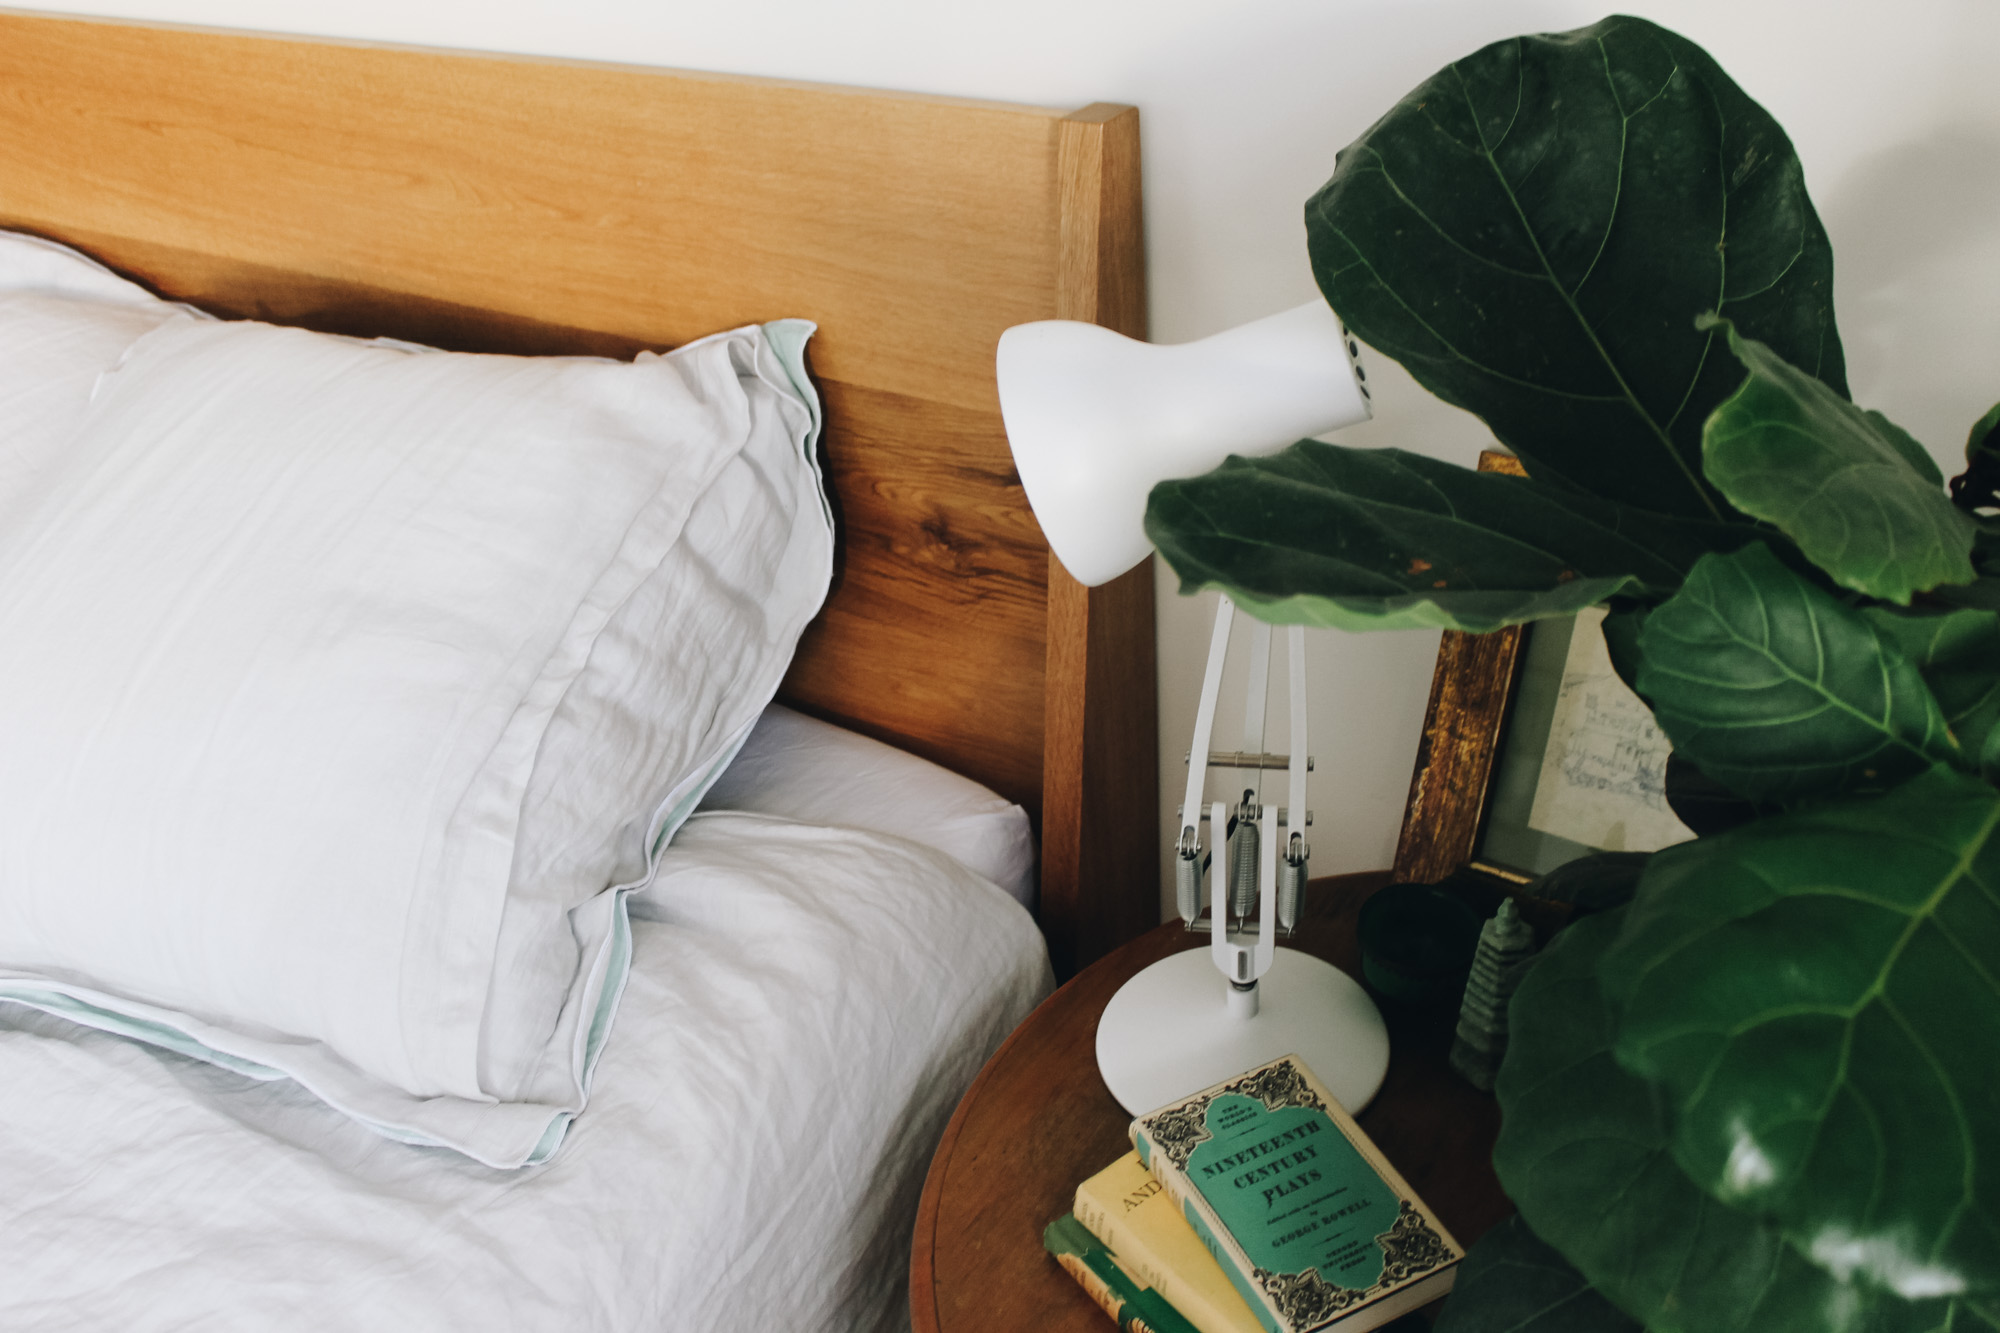 Al and Imo Handmade-mod-bed-custom-american-oak-bed-frame-mid-century-inspired-surf-coast-melbourne-australia-6.jpg